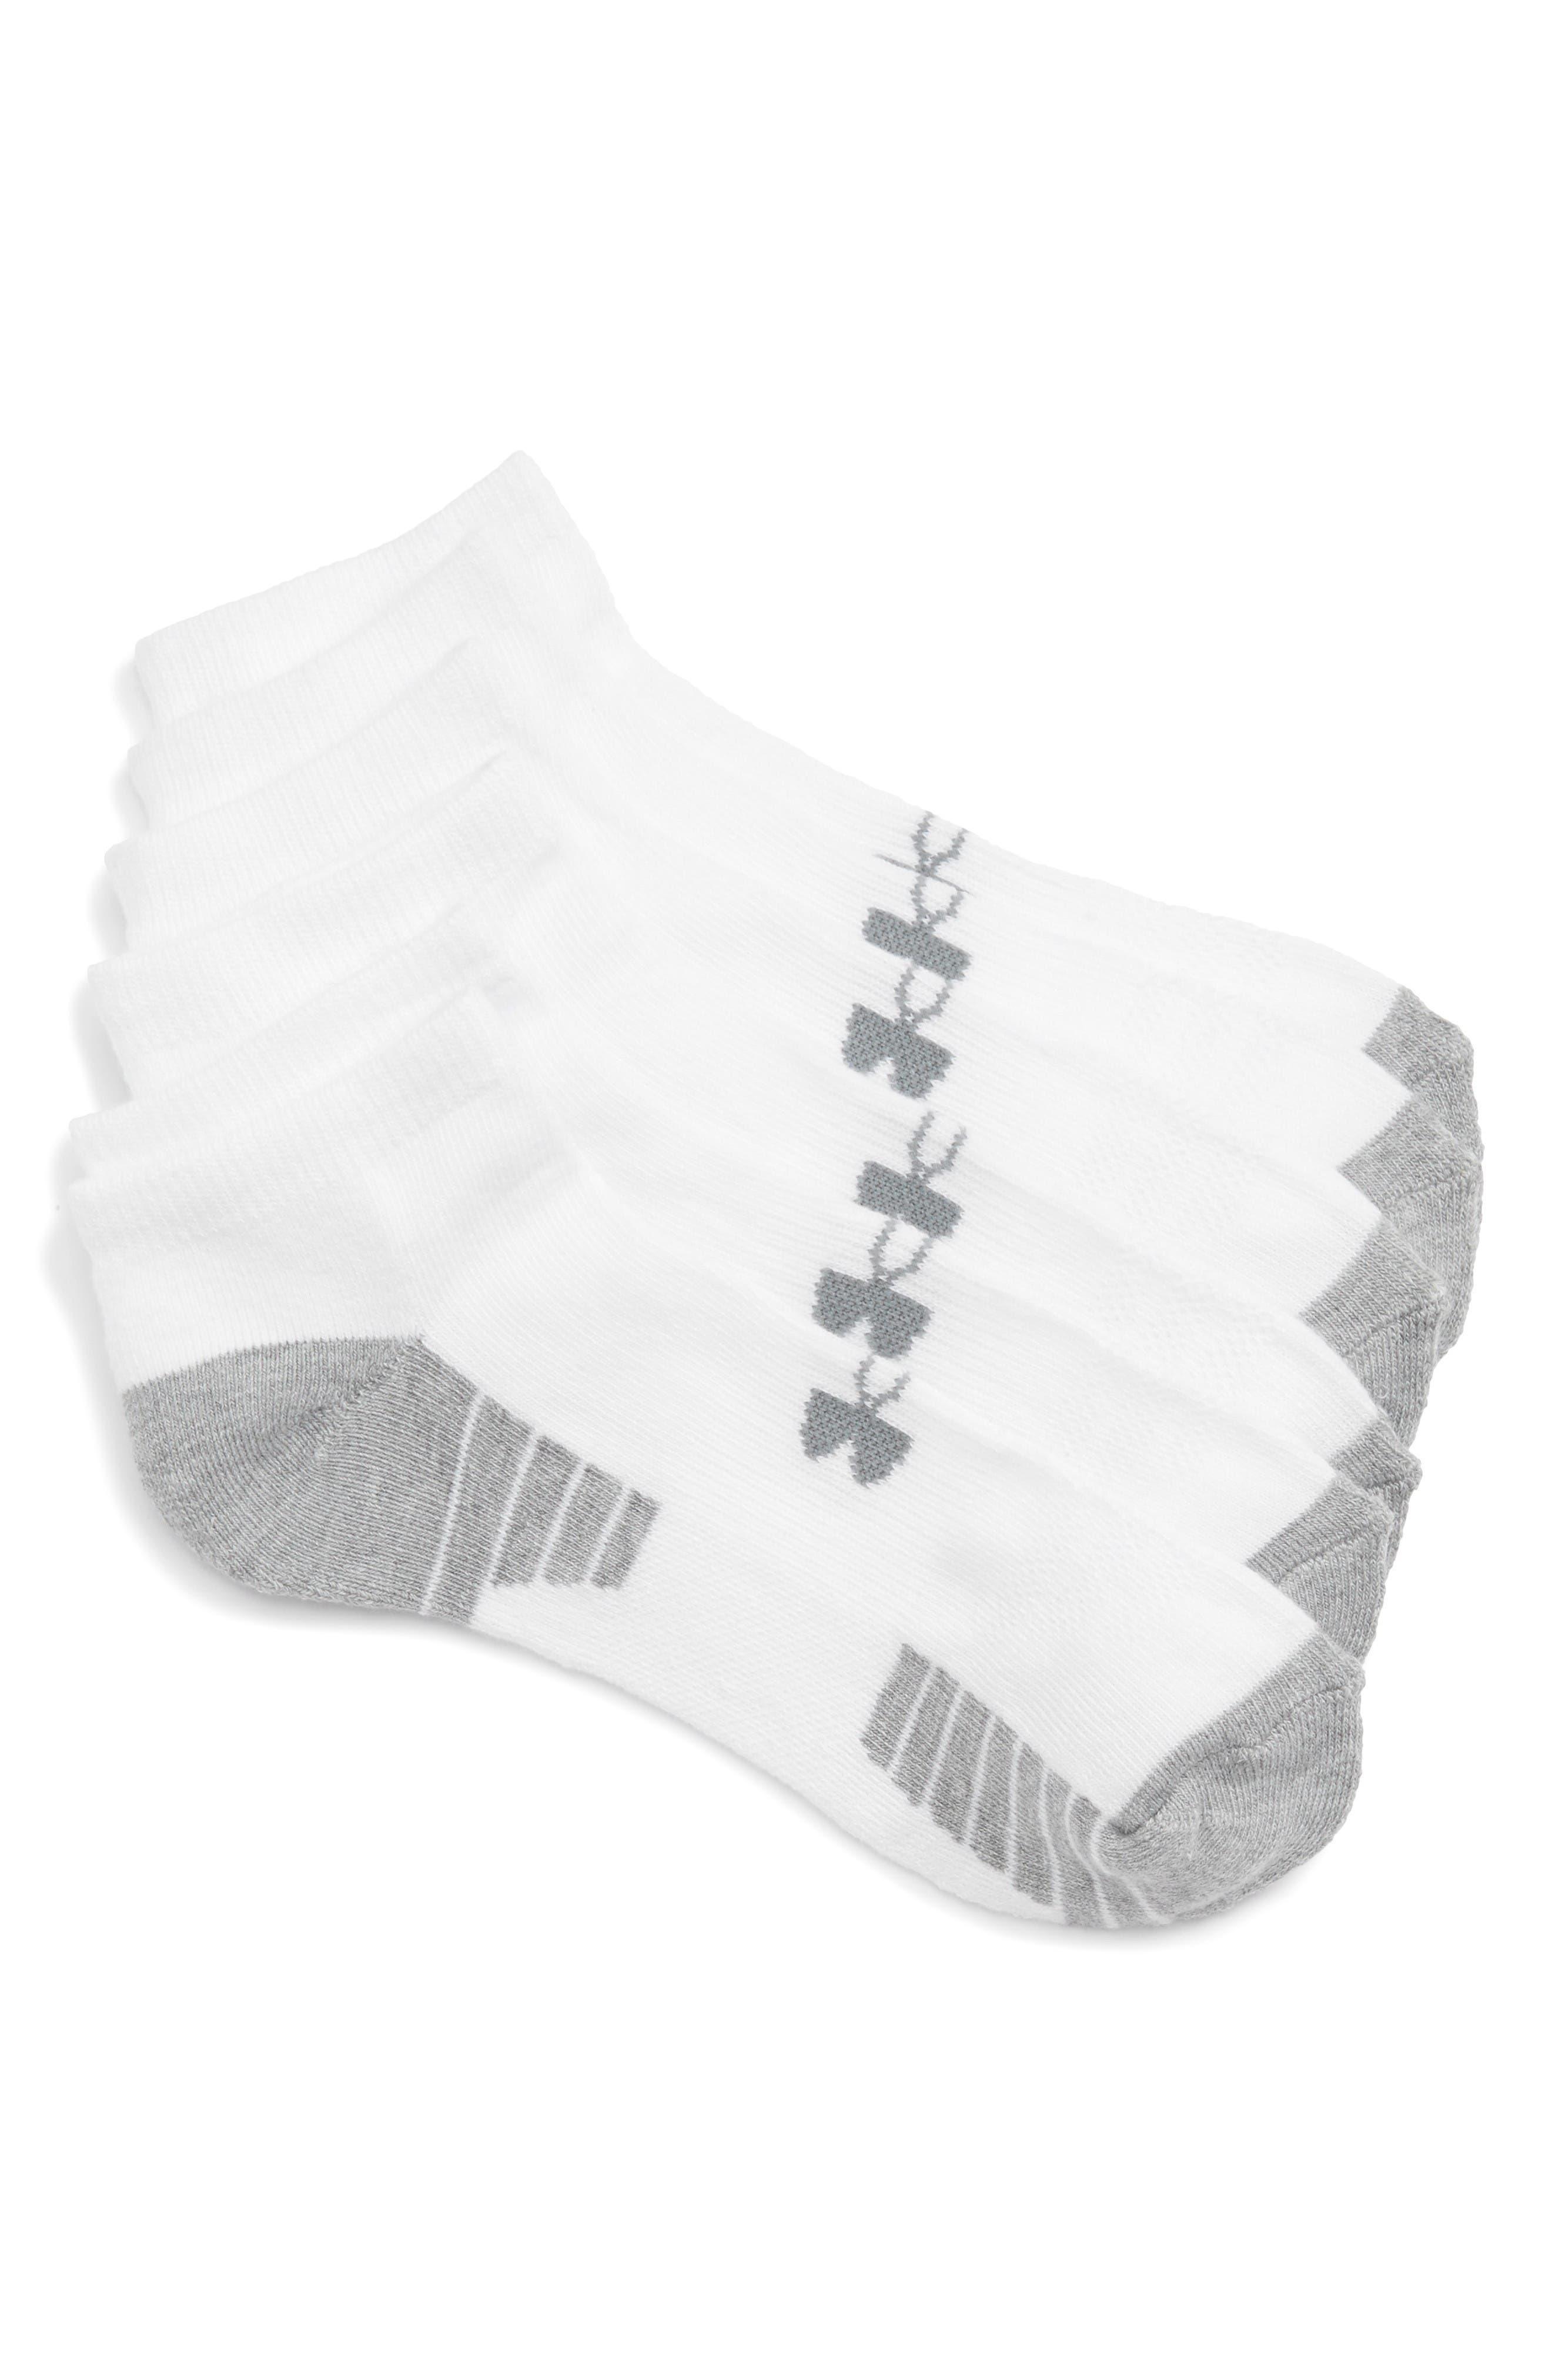 Main Image - Under Armour HeatGear 3-Pack No-Show Socks